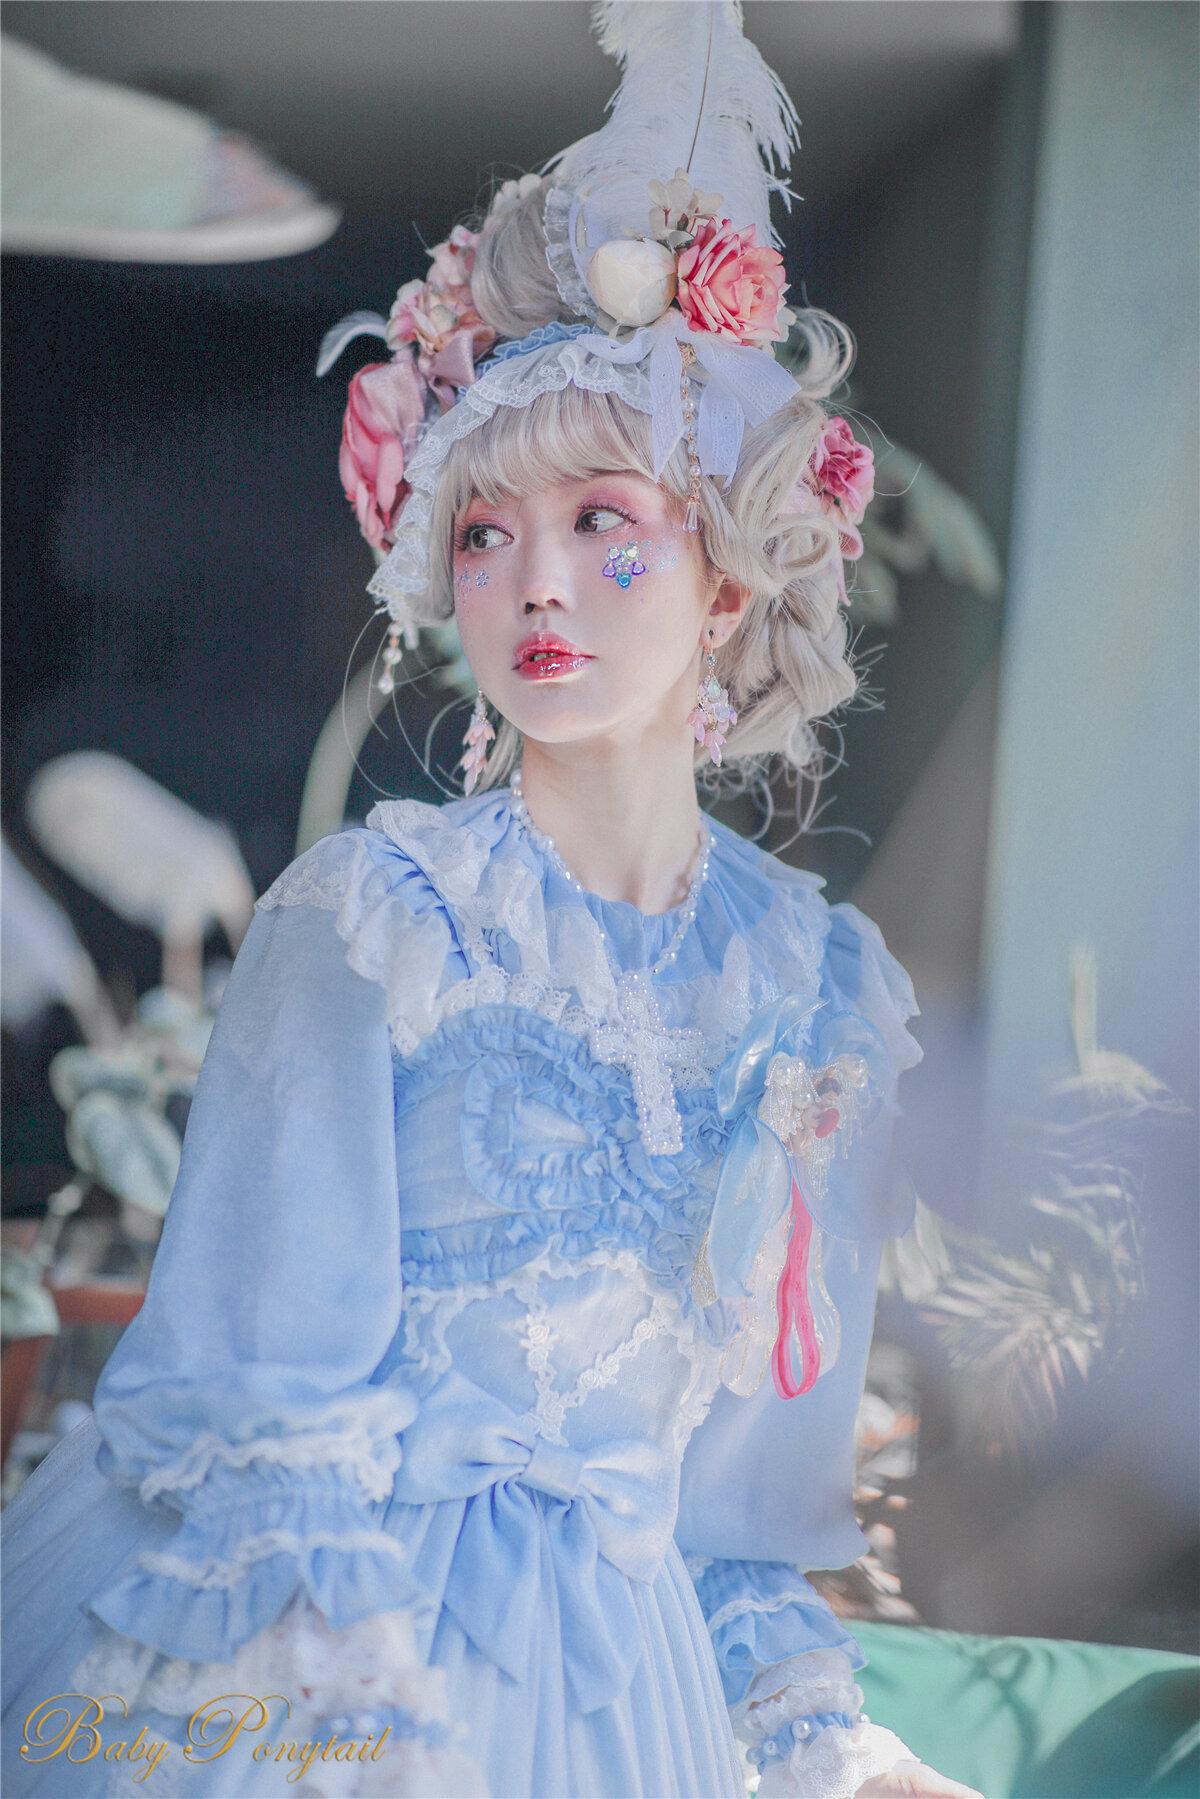 Babyponytail_Heavenly Teardrops_Model photo_JSK SAX_KAKA_02.jpg